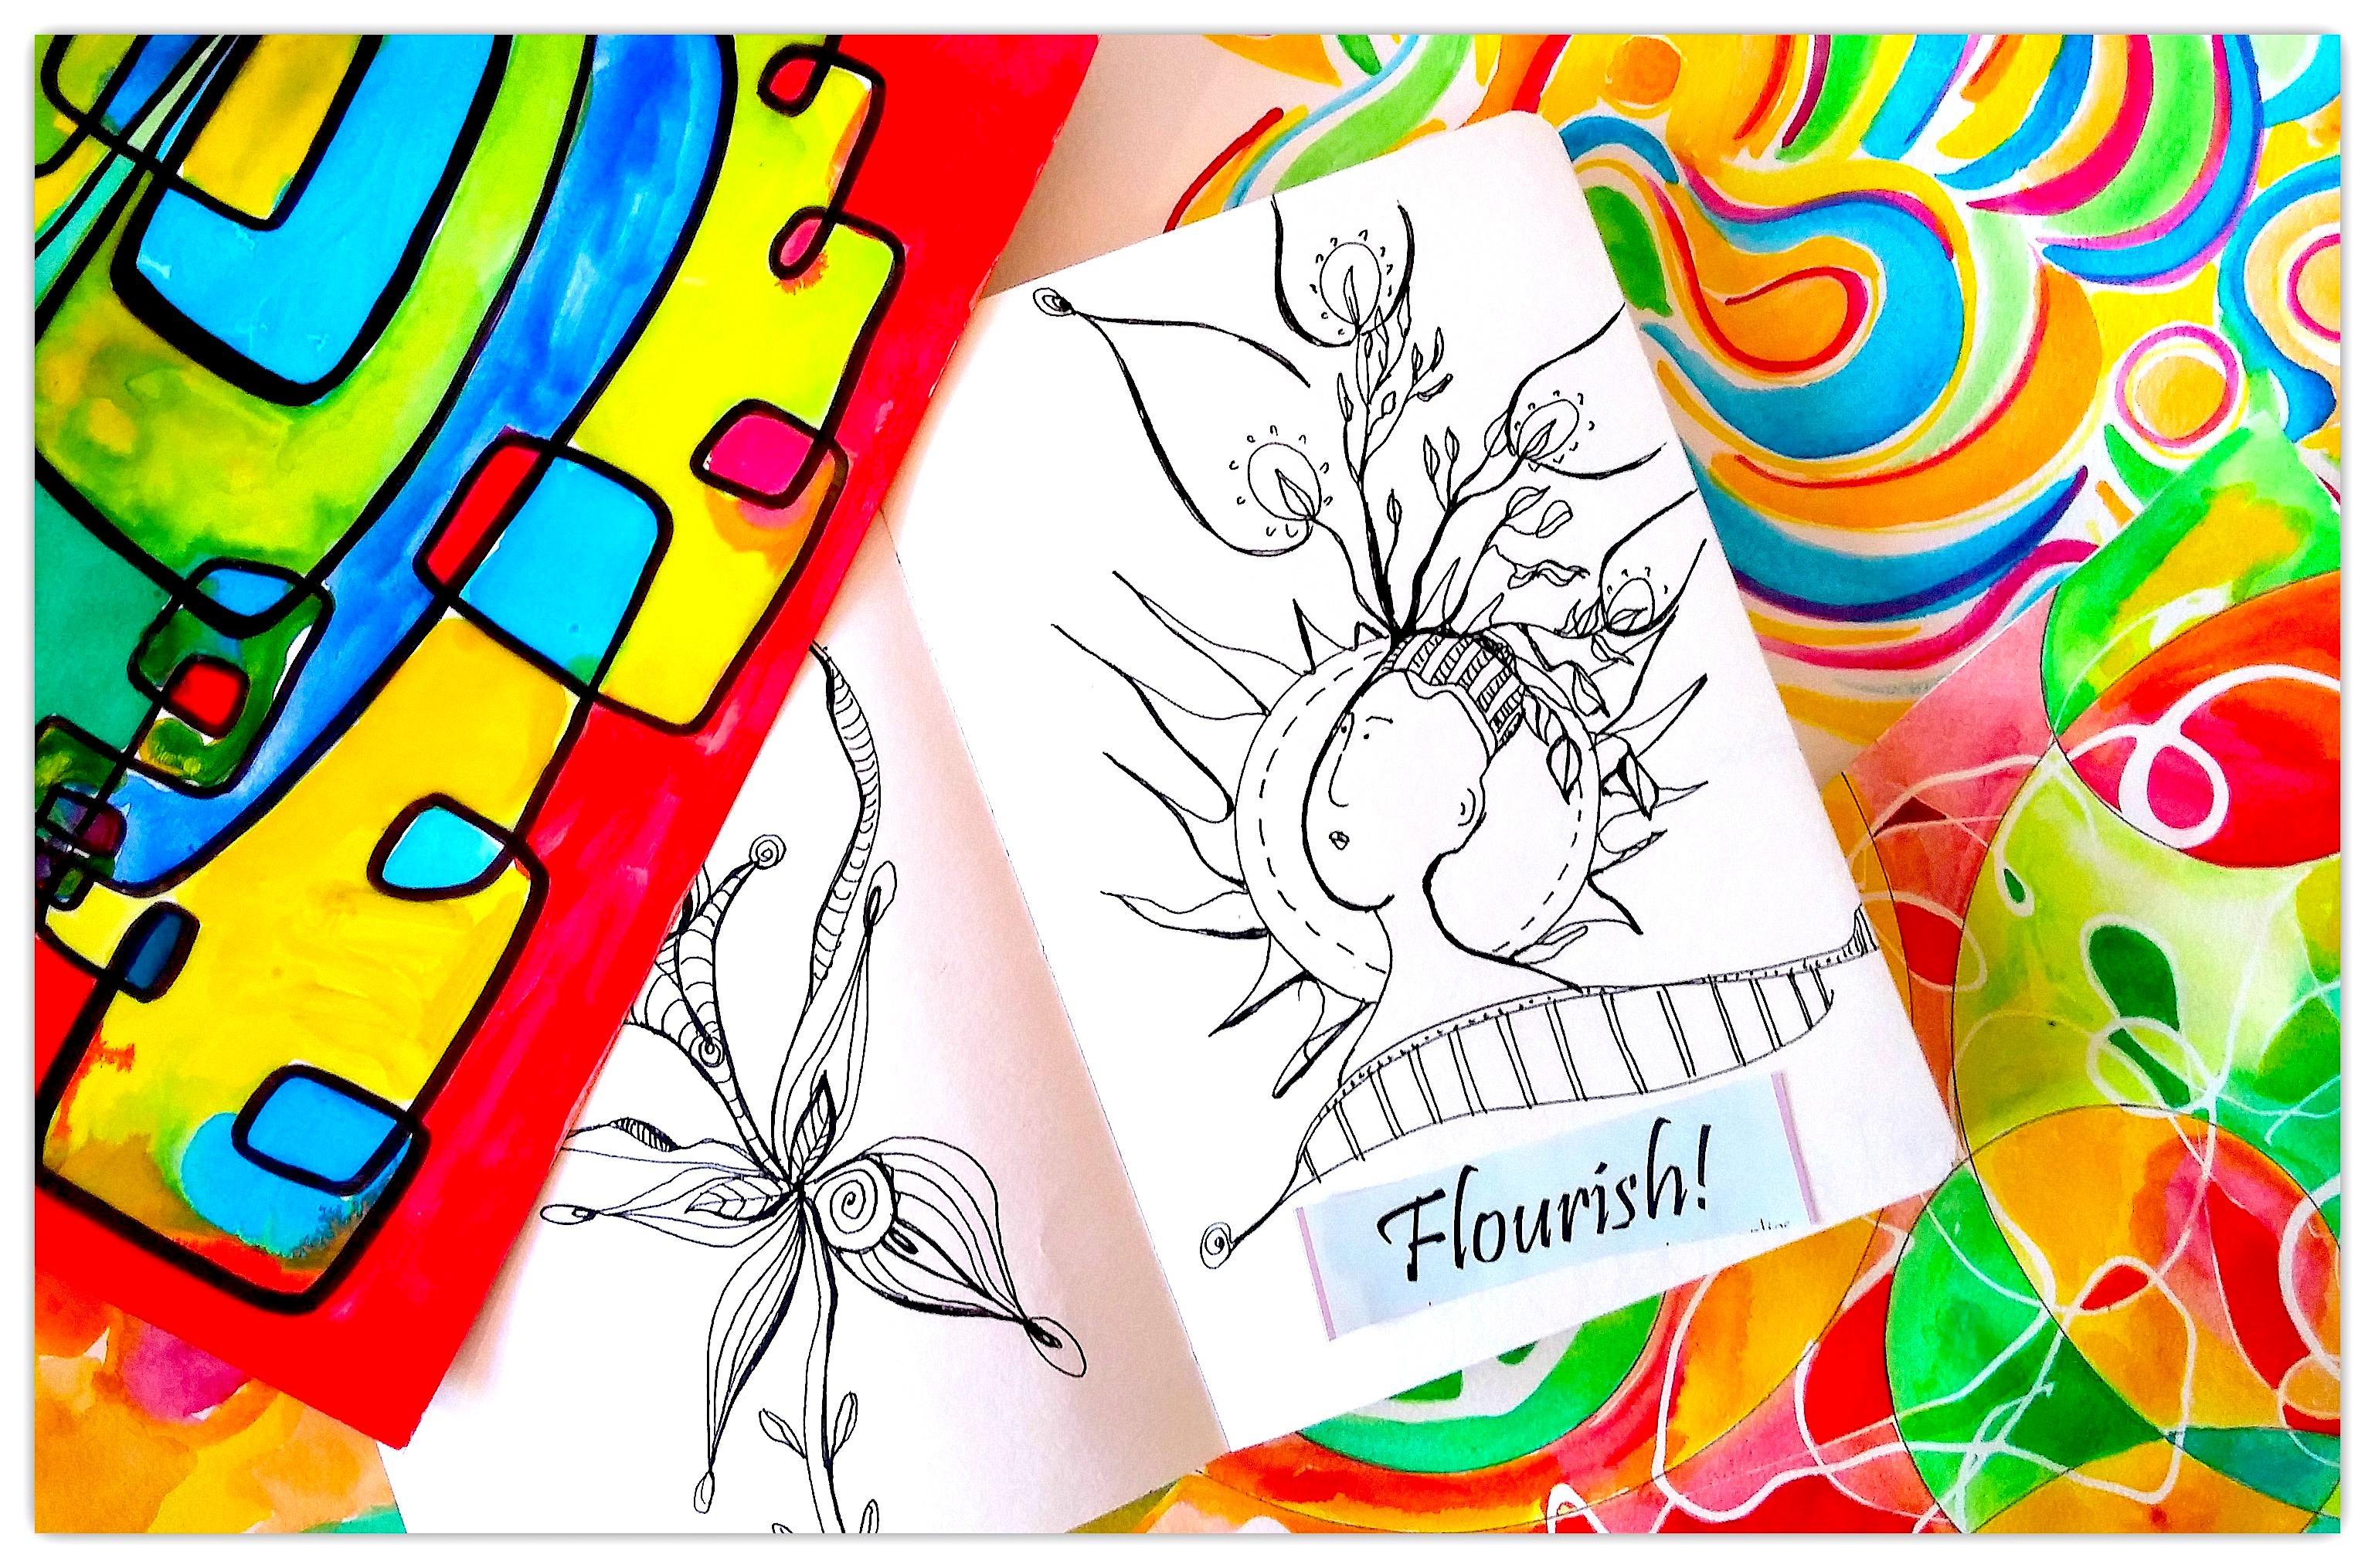 Flourish   Expressive Art   Shelley Klammer